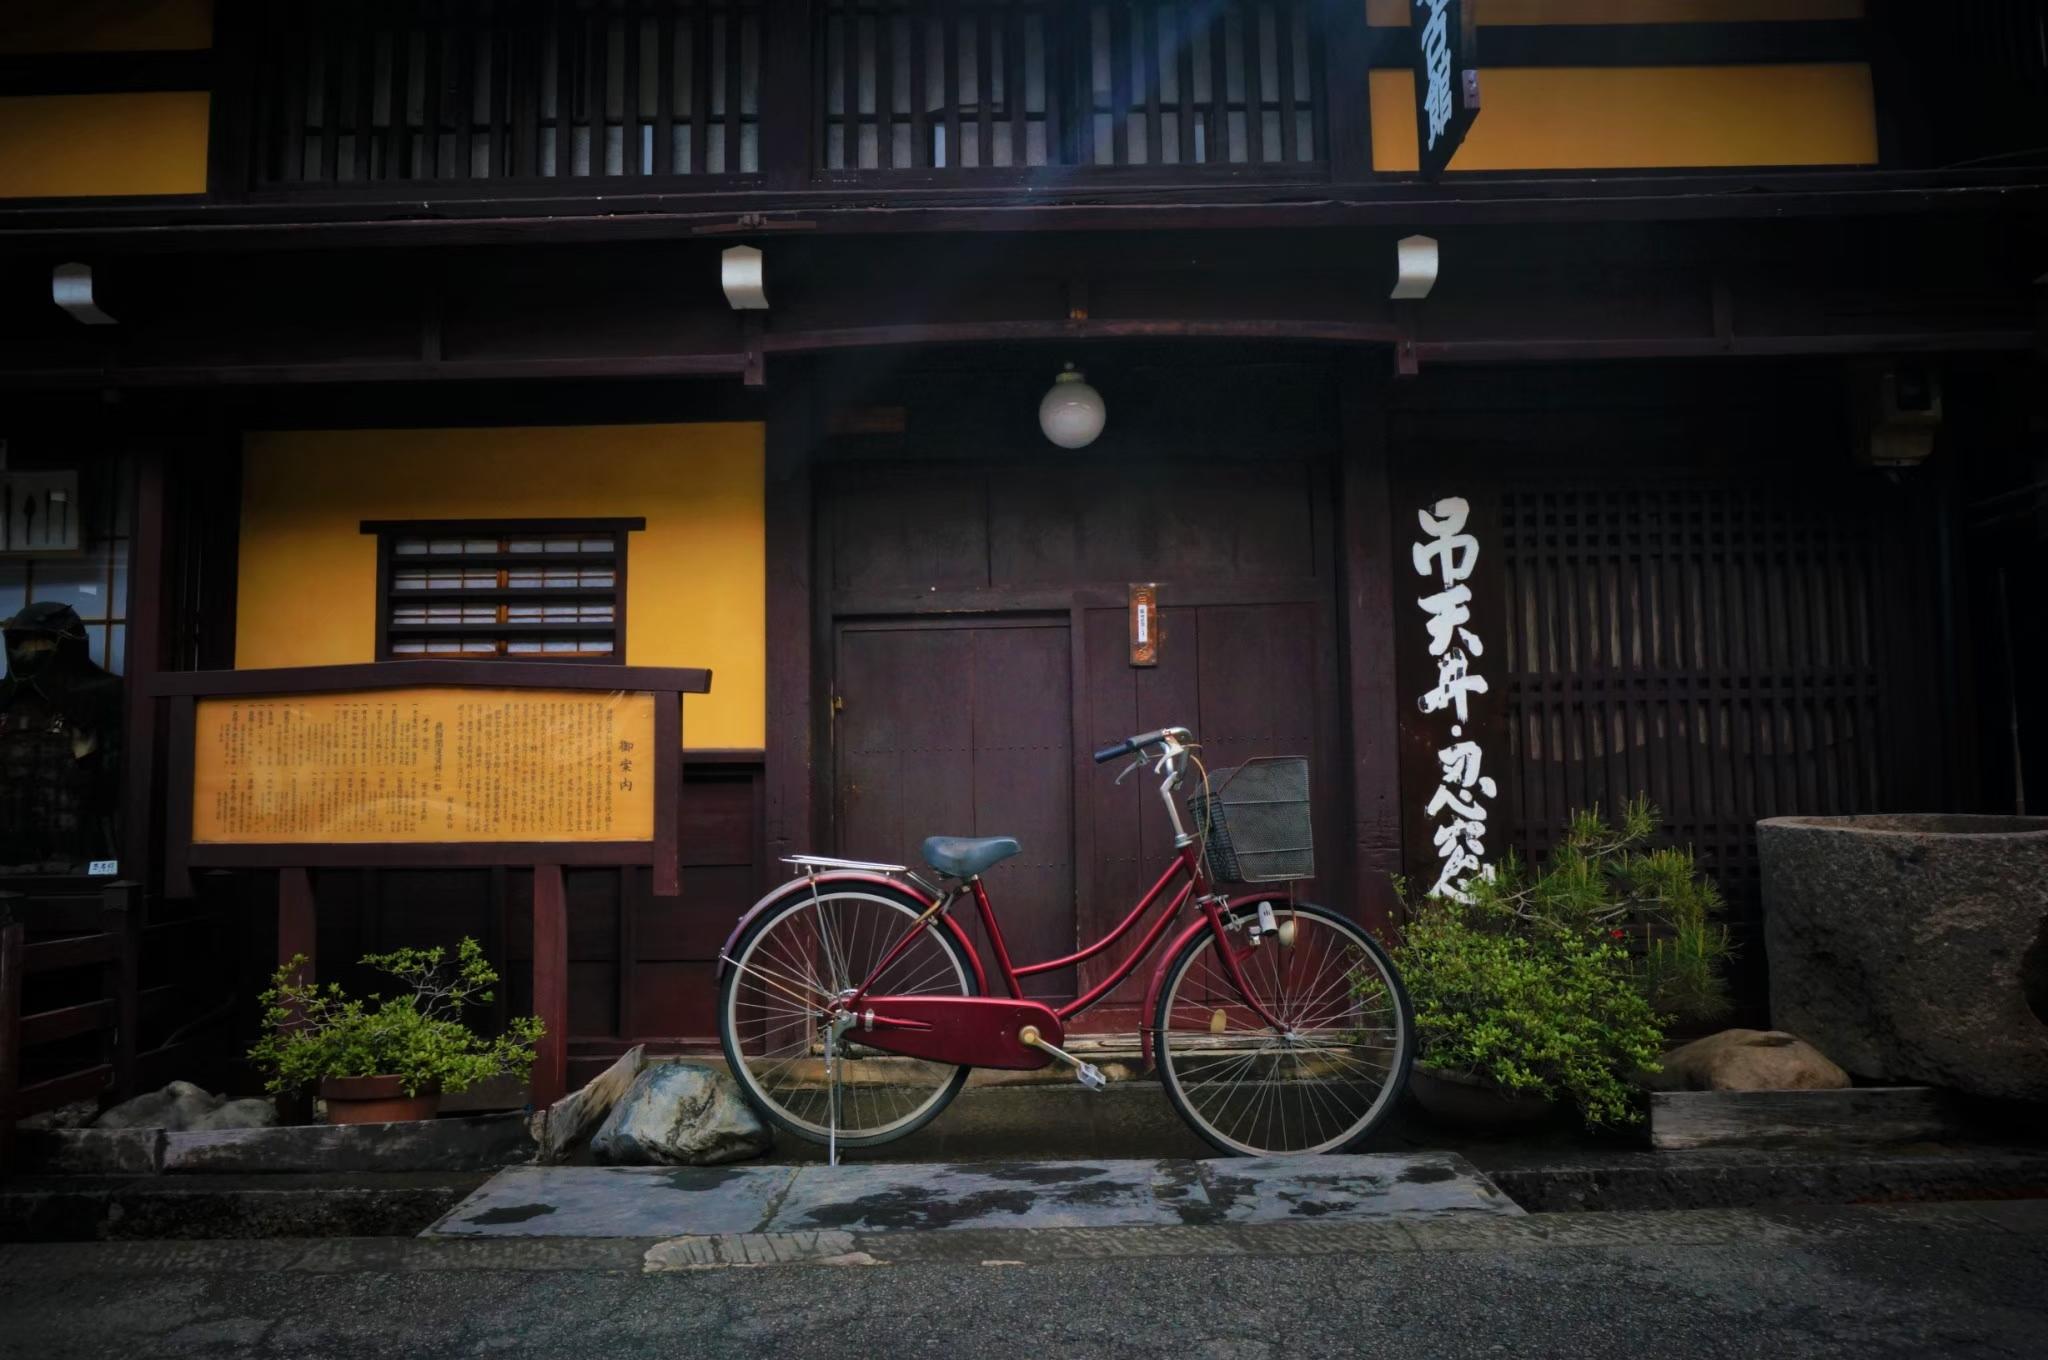 Takayama Historic Old Town